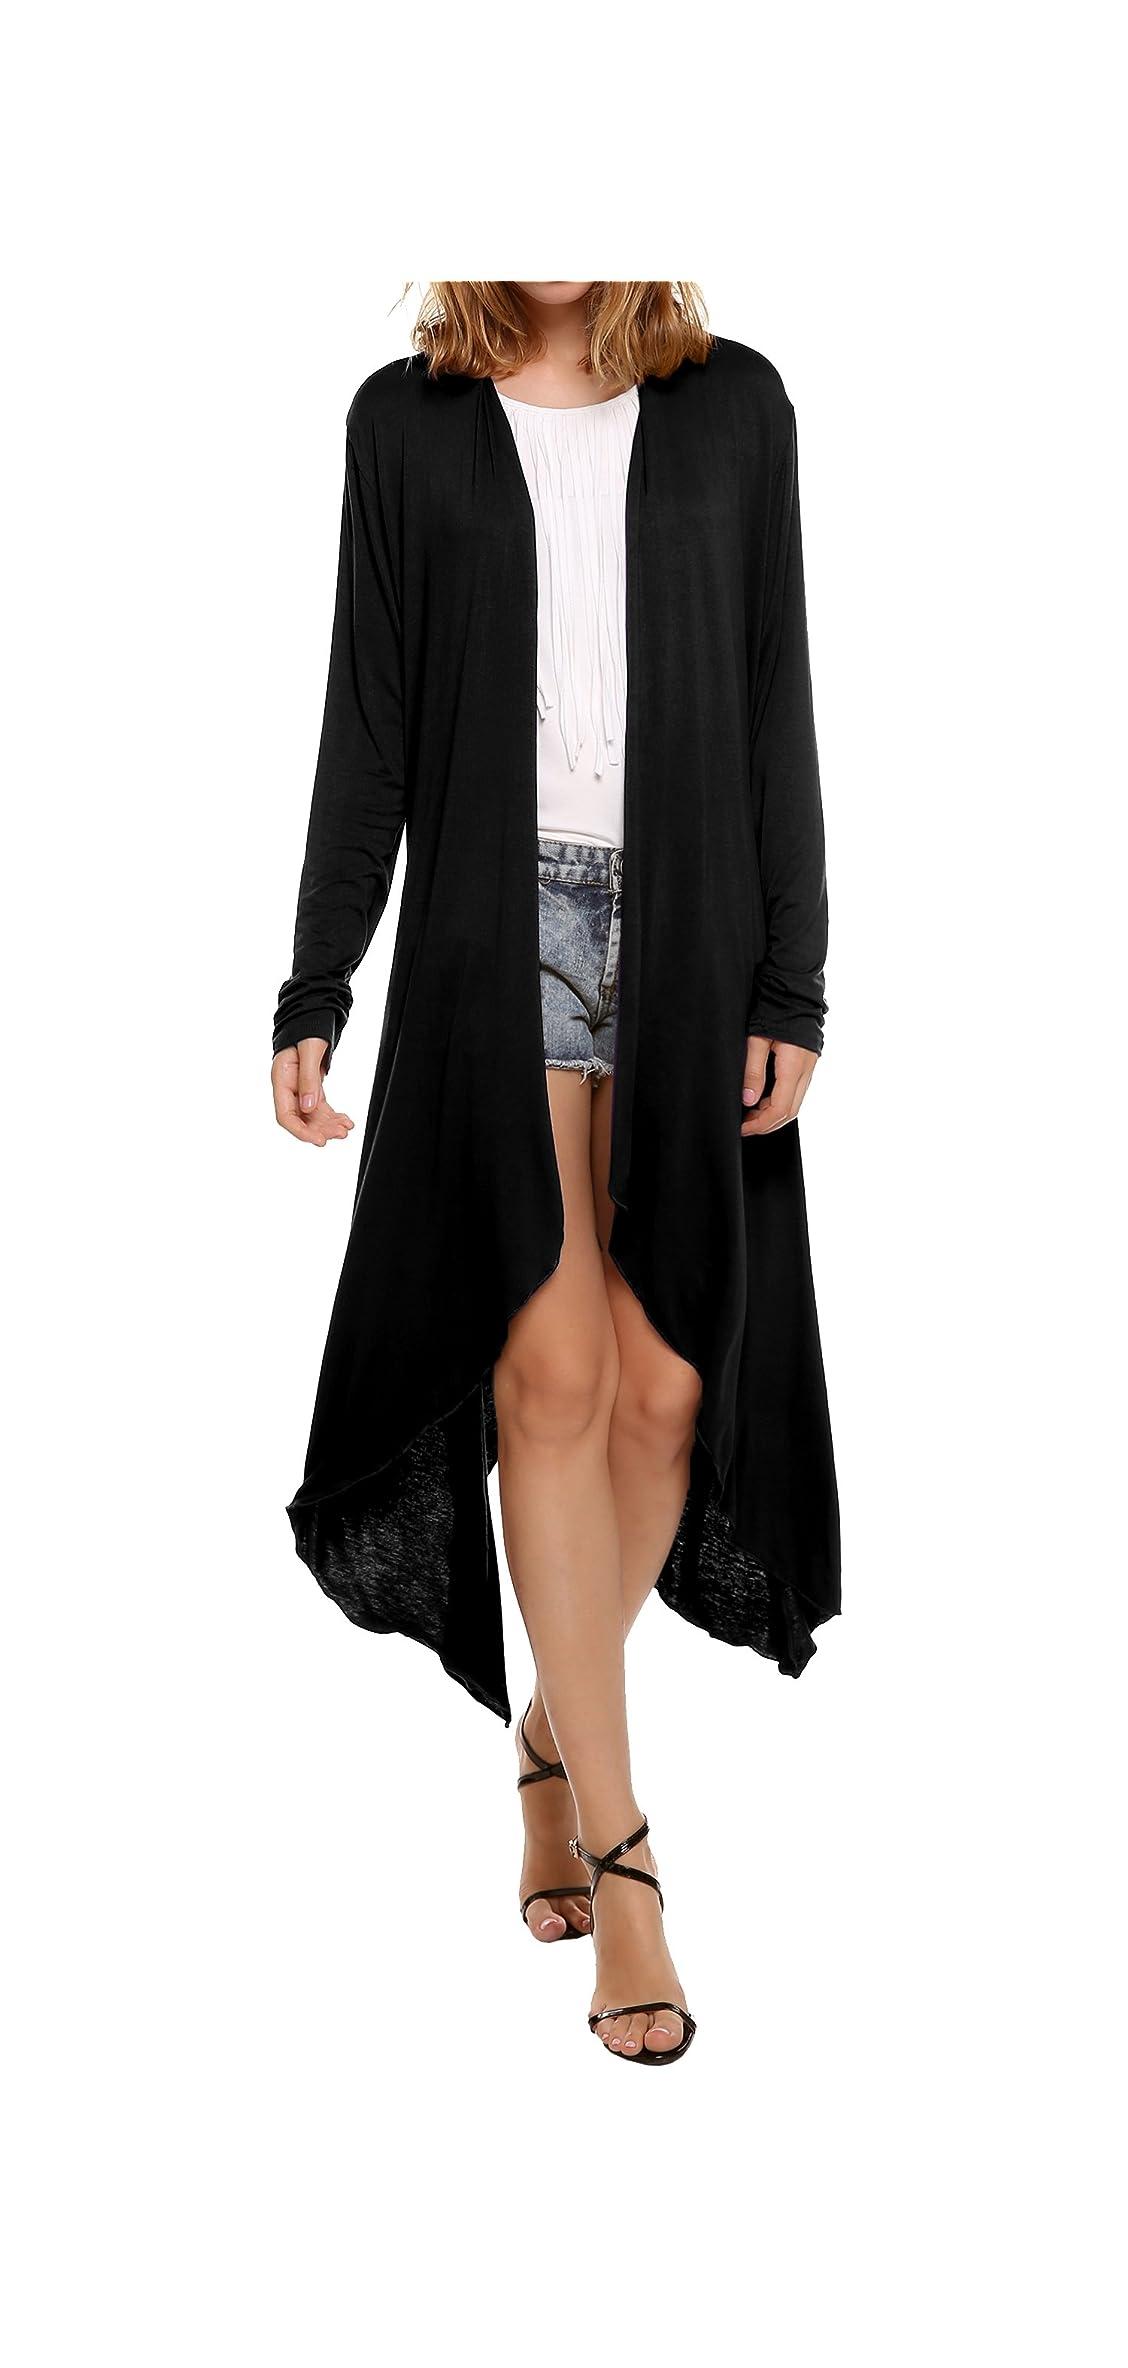 Long Cardigan For Women, Lightweight Long Sleeve Open